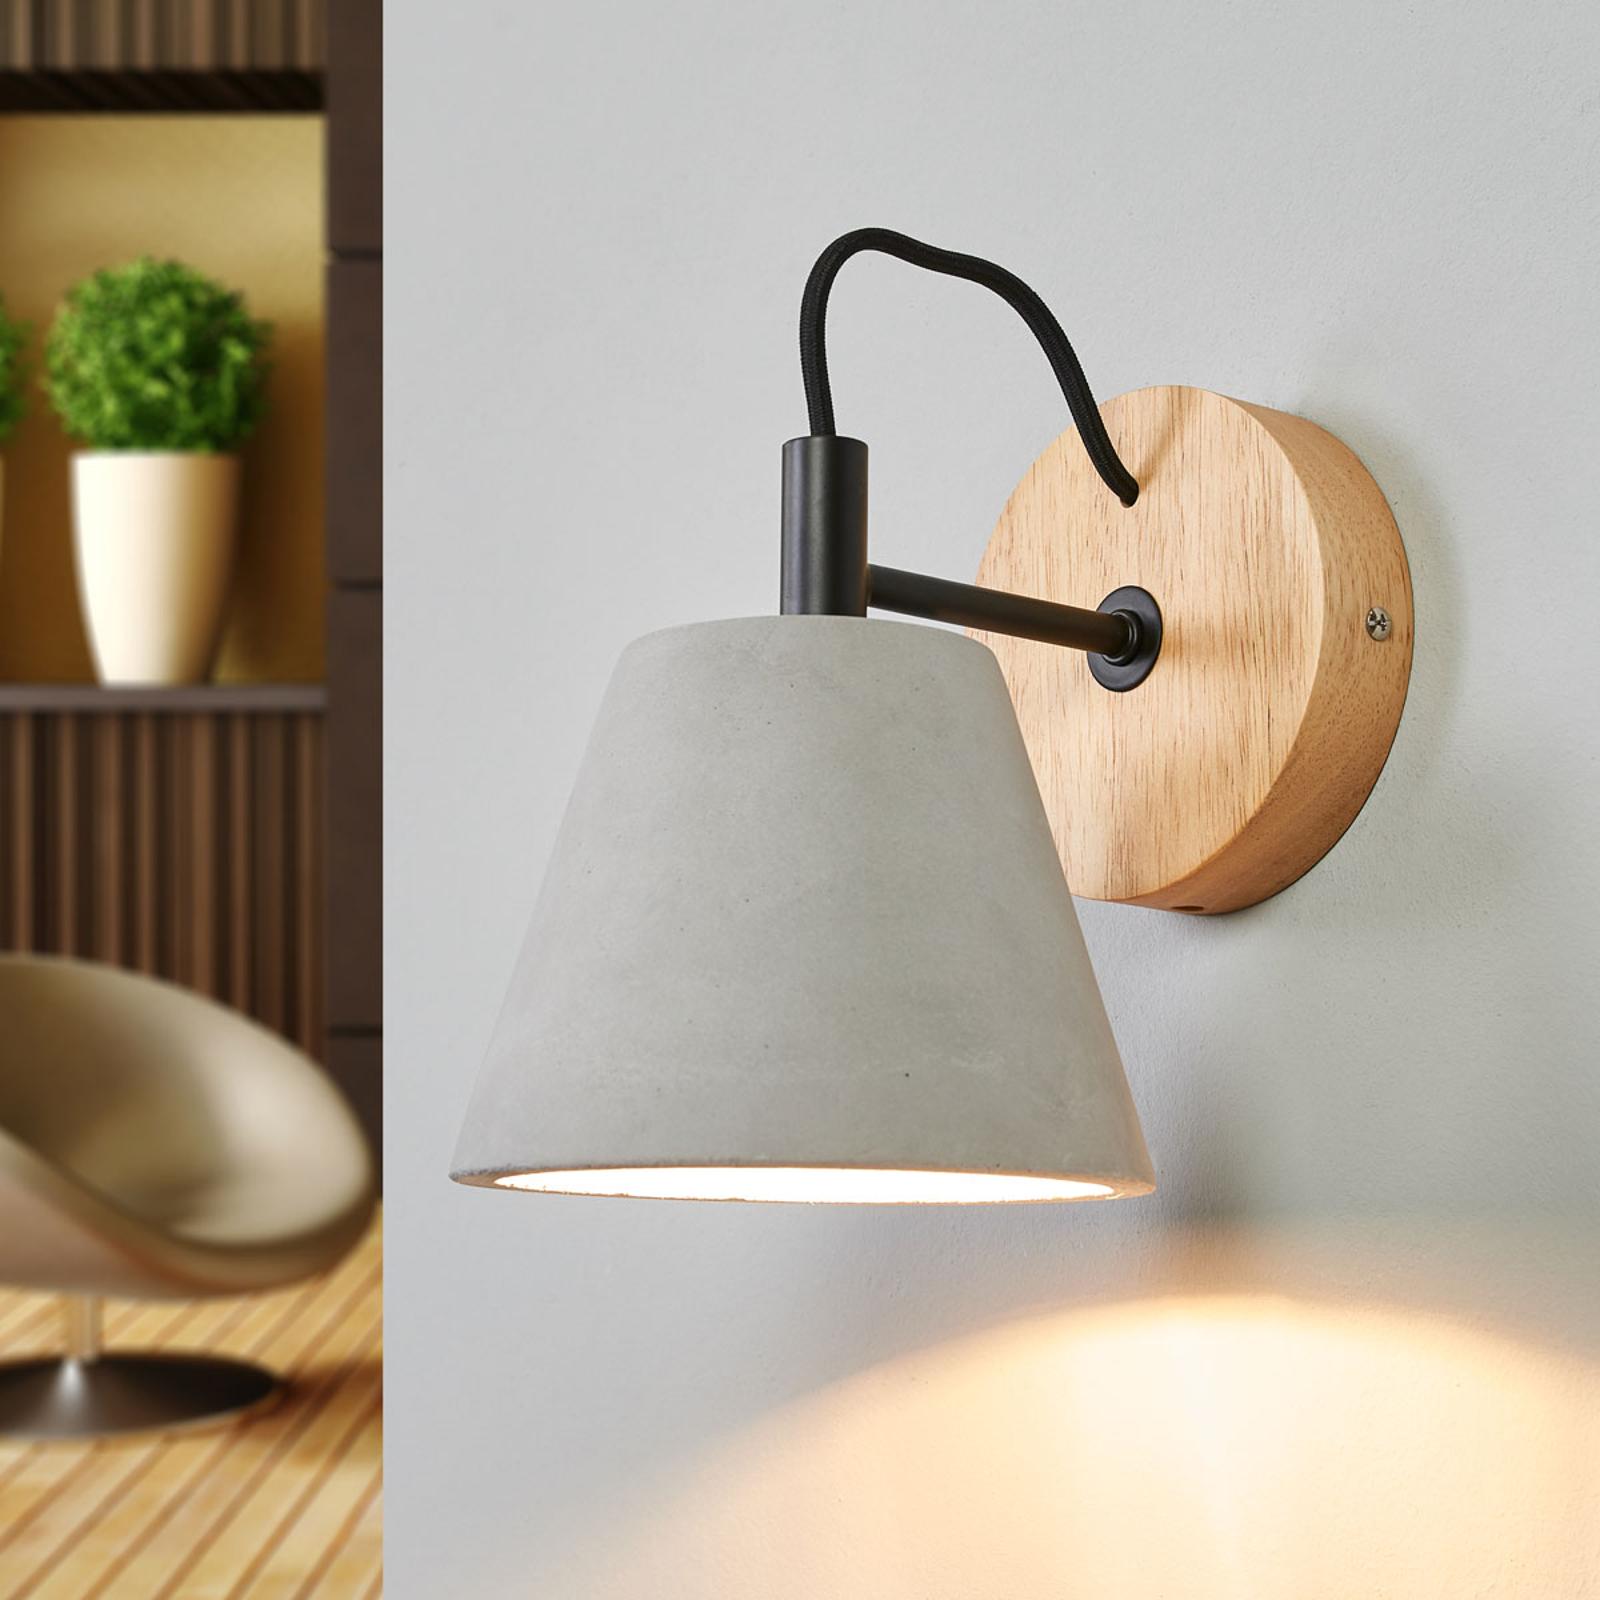 Possio - wandlamp met betonnen kap en hout